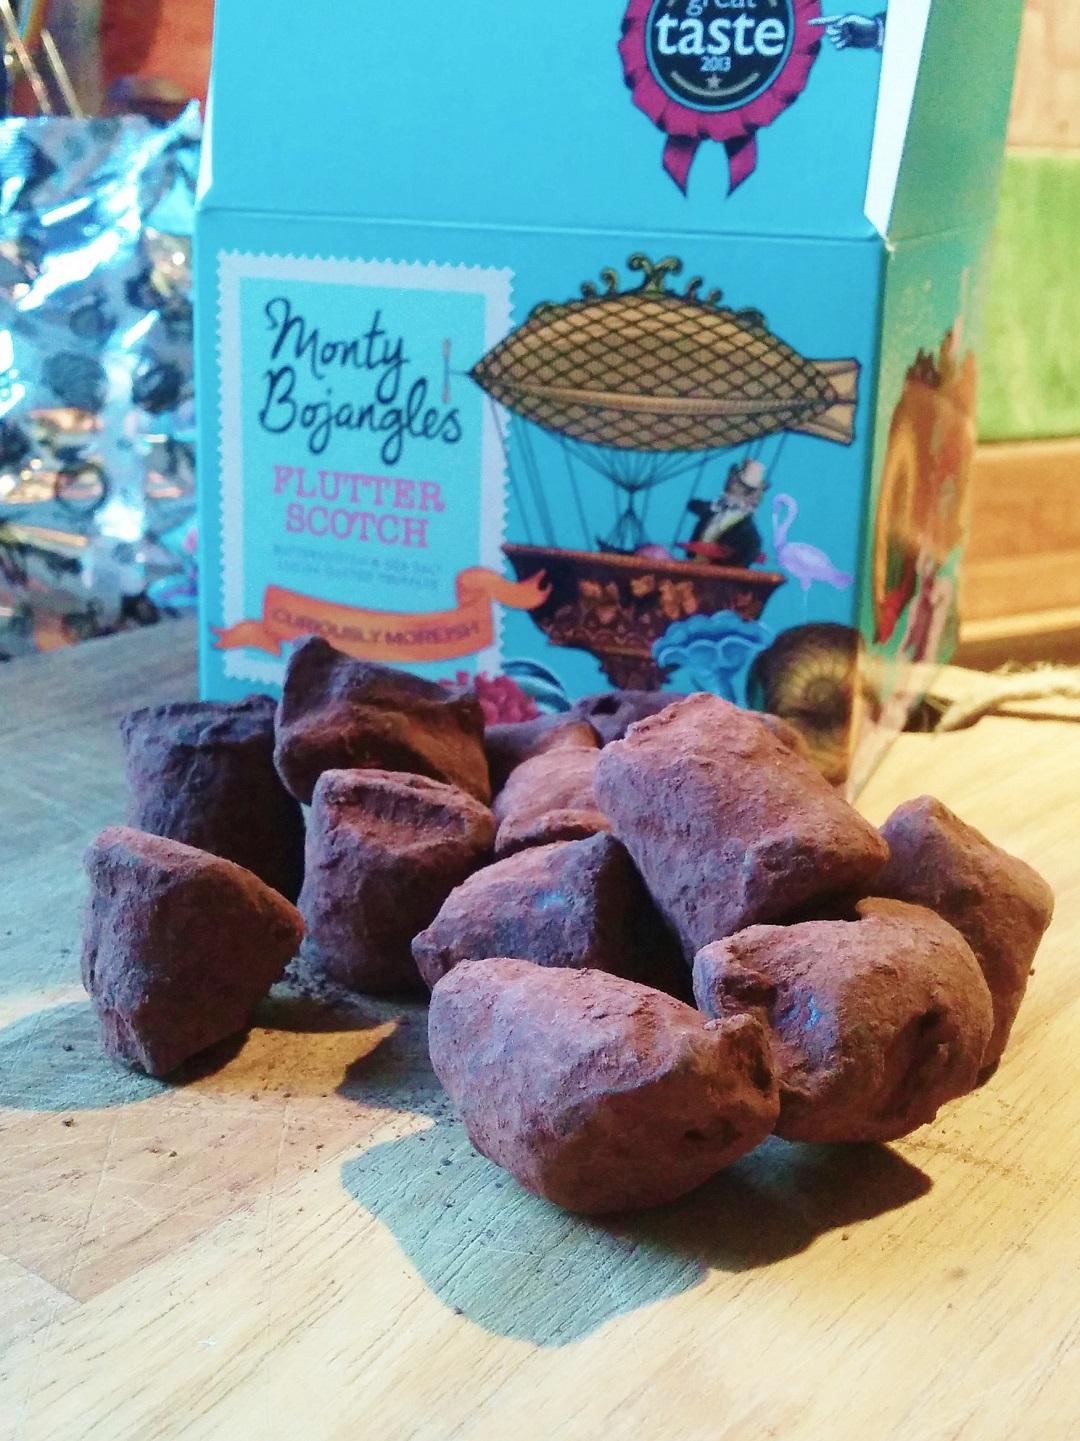 truffle-heaven-monty-bojangles-truffles-box-background